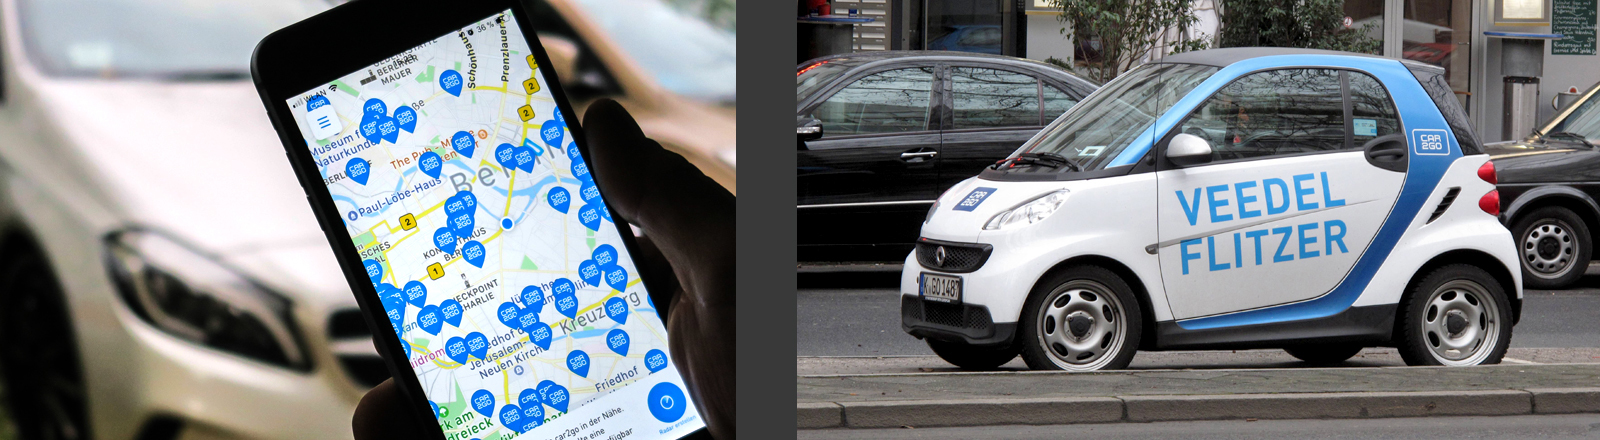 Carsharing-Auto und Carsharing-App